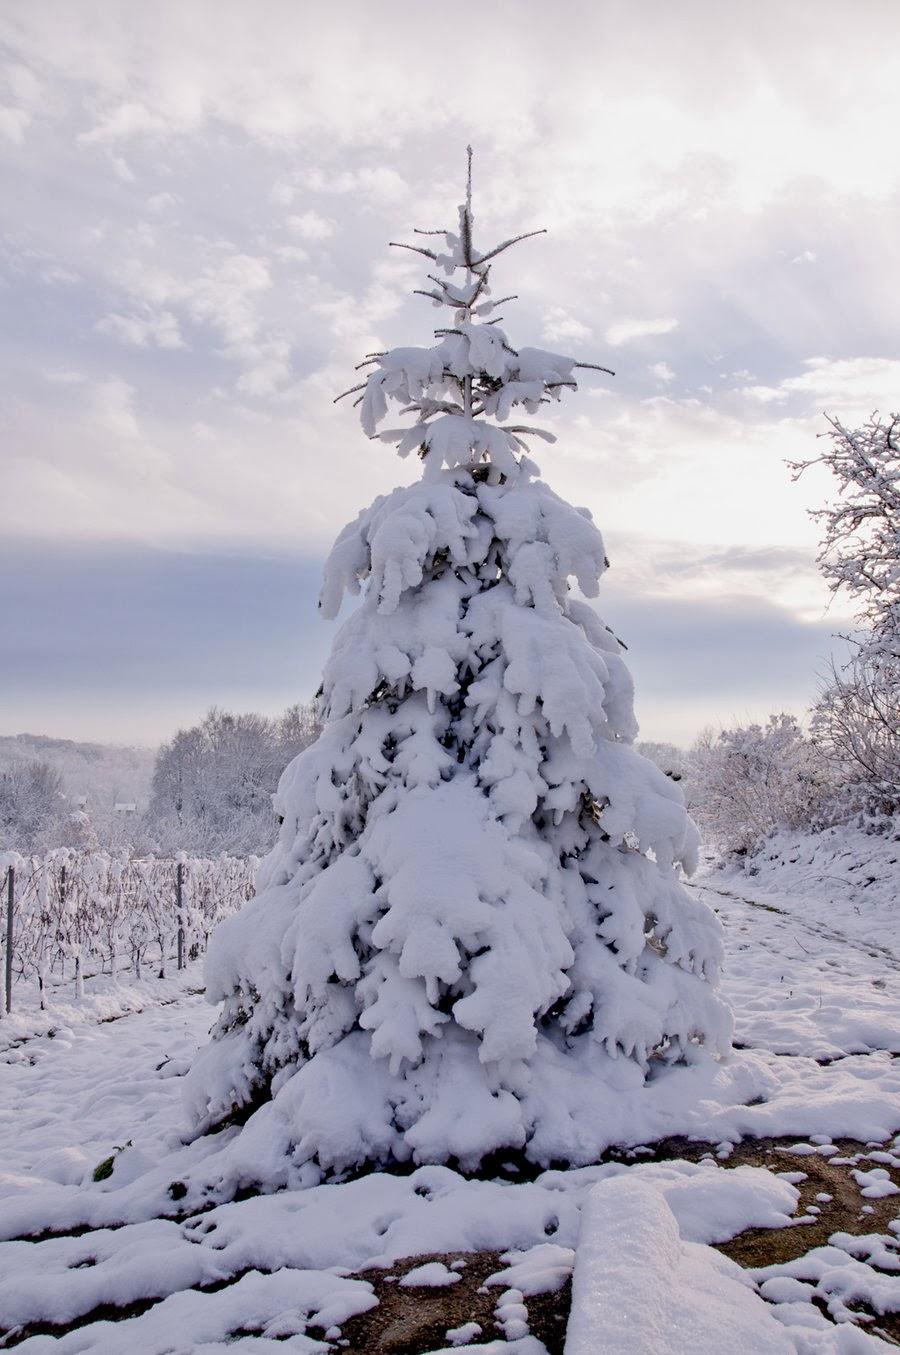 Snow covered Christmas tree,USA:   Shah Nasir Travel